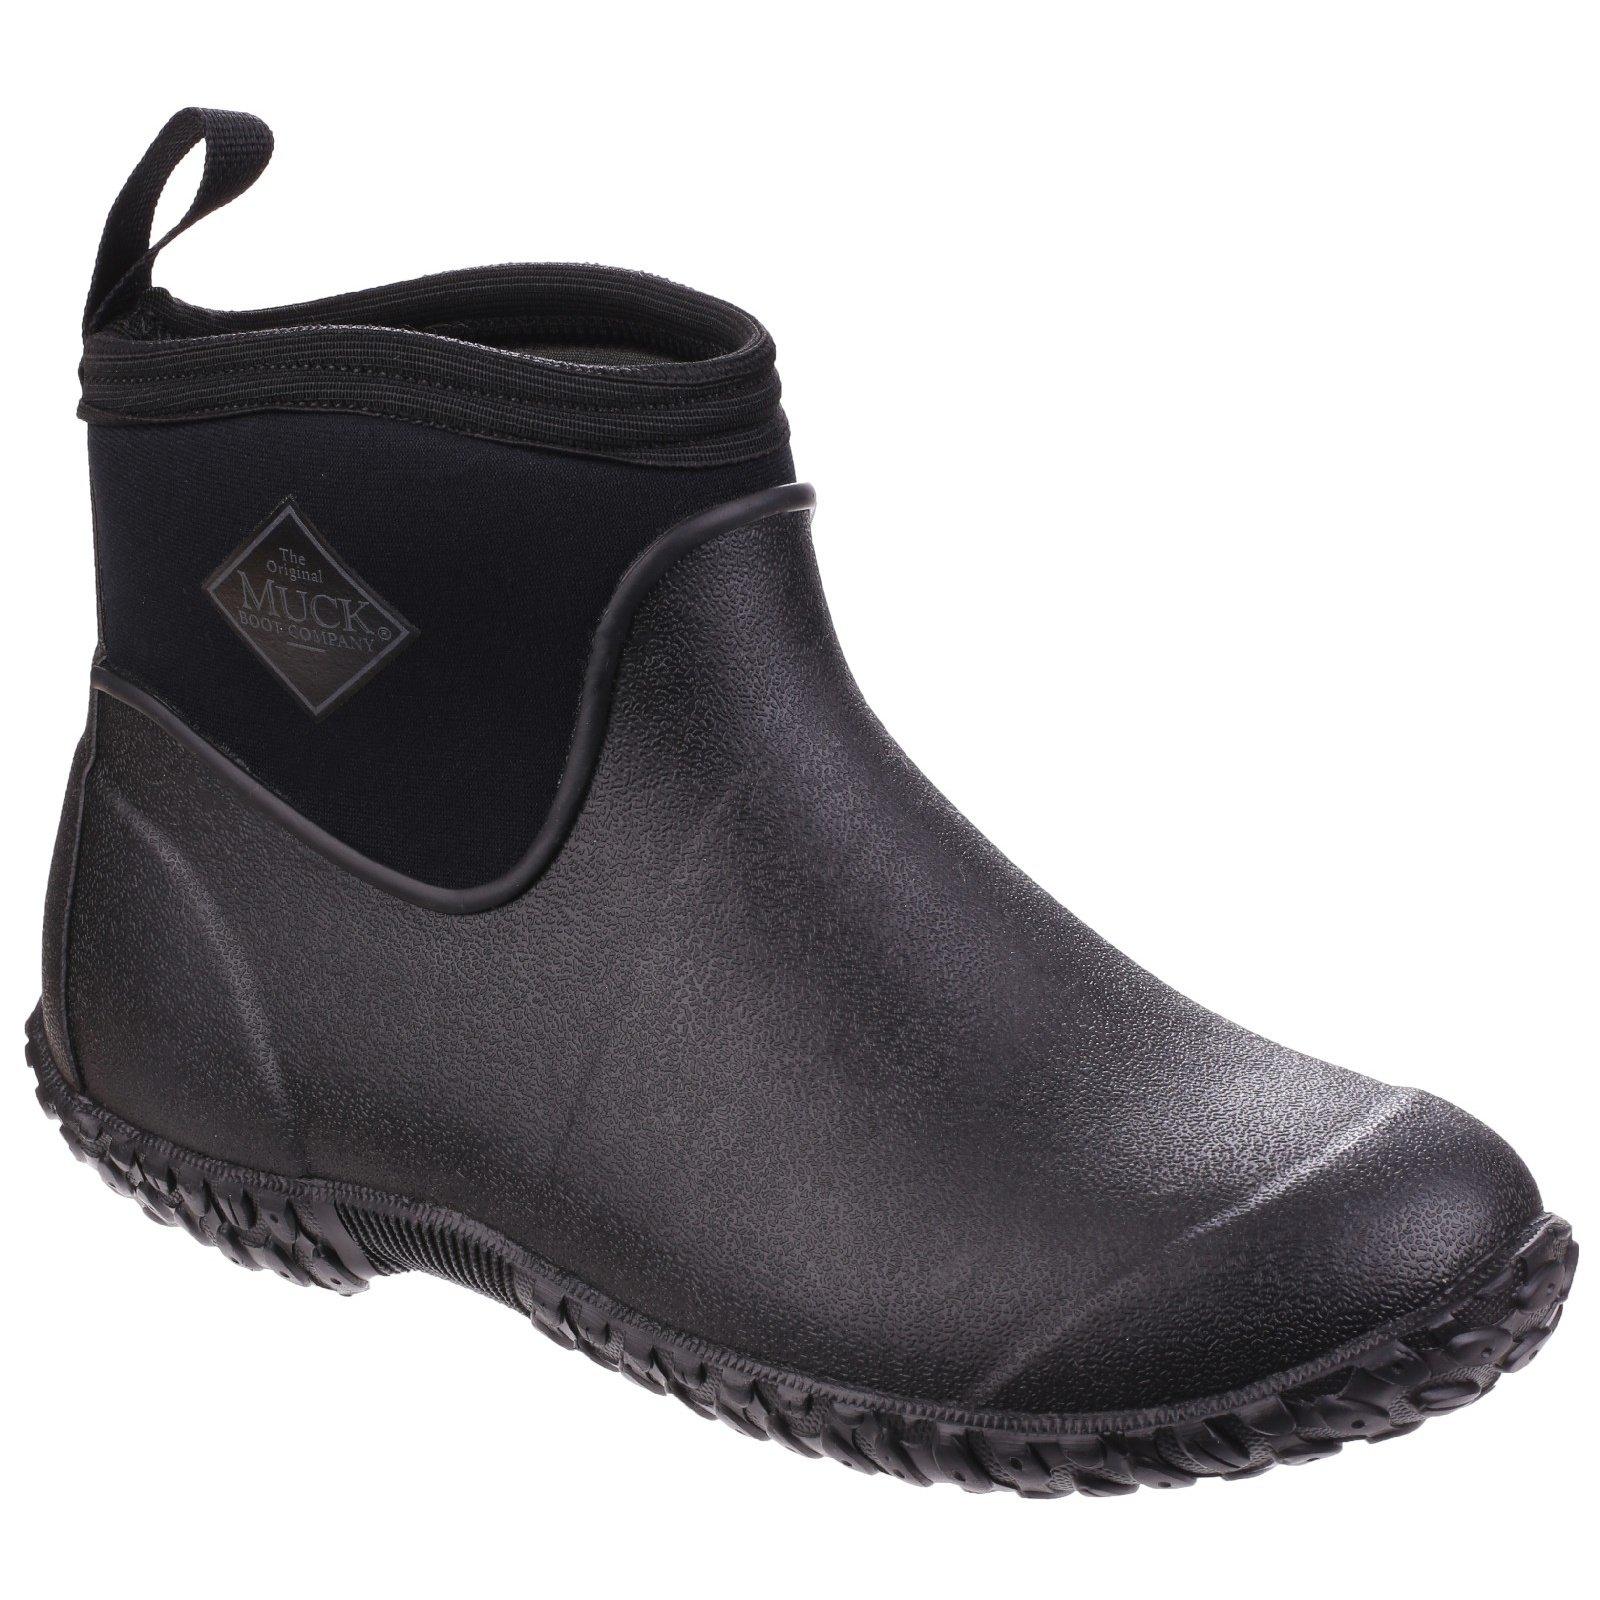 Muck Boot Mens Muckster II Ankle All-Purpose Lightweight Shoe (7 US) (Black/Black)